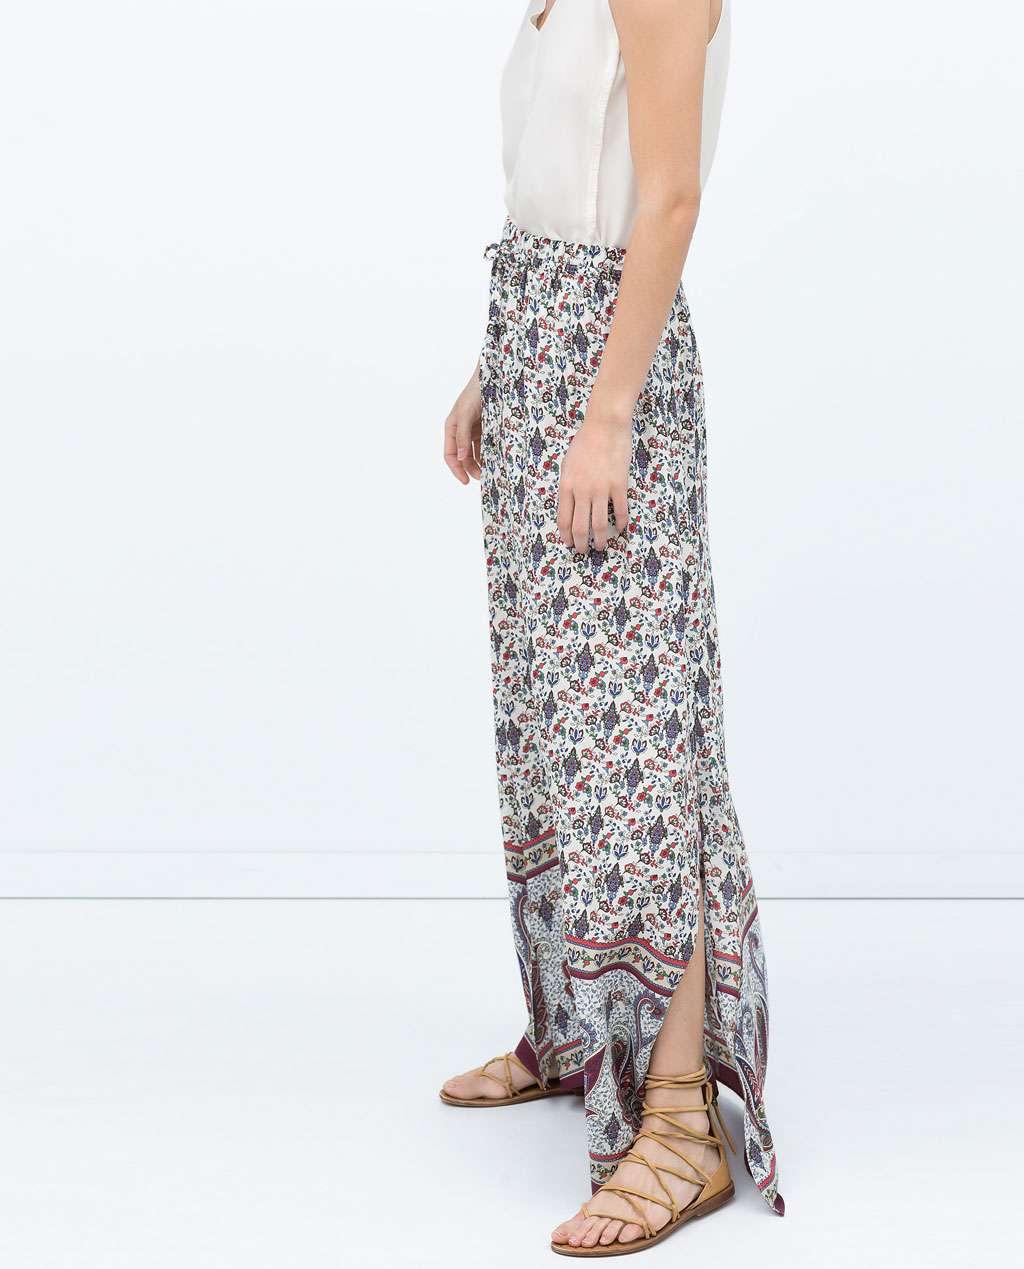 ropa de moda - falda larga zara verano 2015